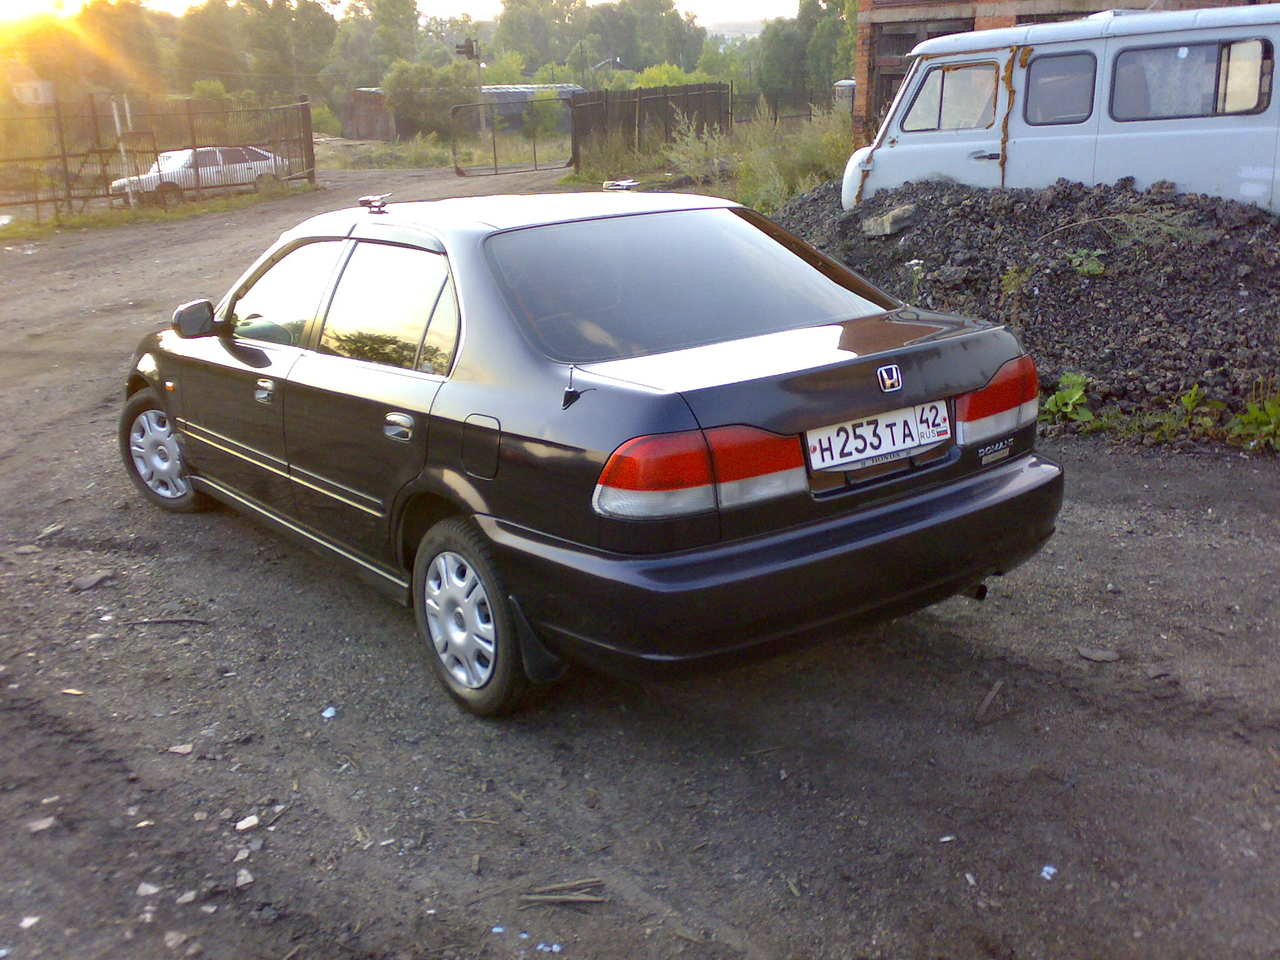 c17e8e9691f9 1999 Honda Domani Photos, 1.6, Gasoline, FF, CVT For Sale